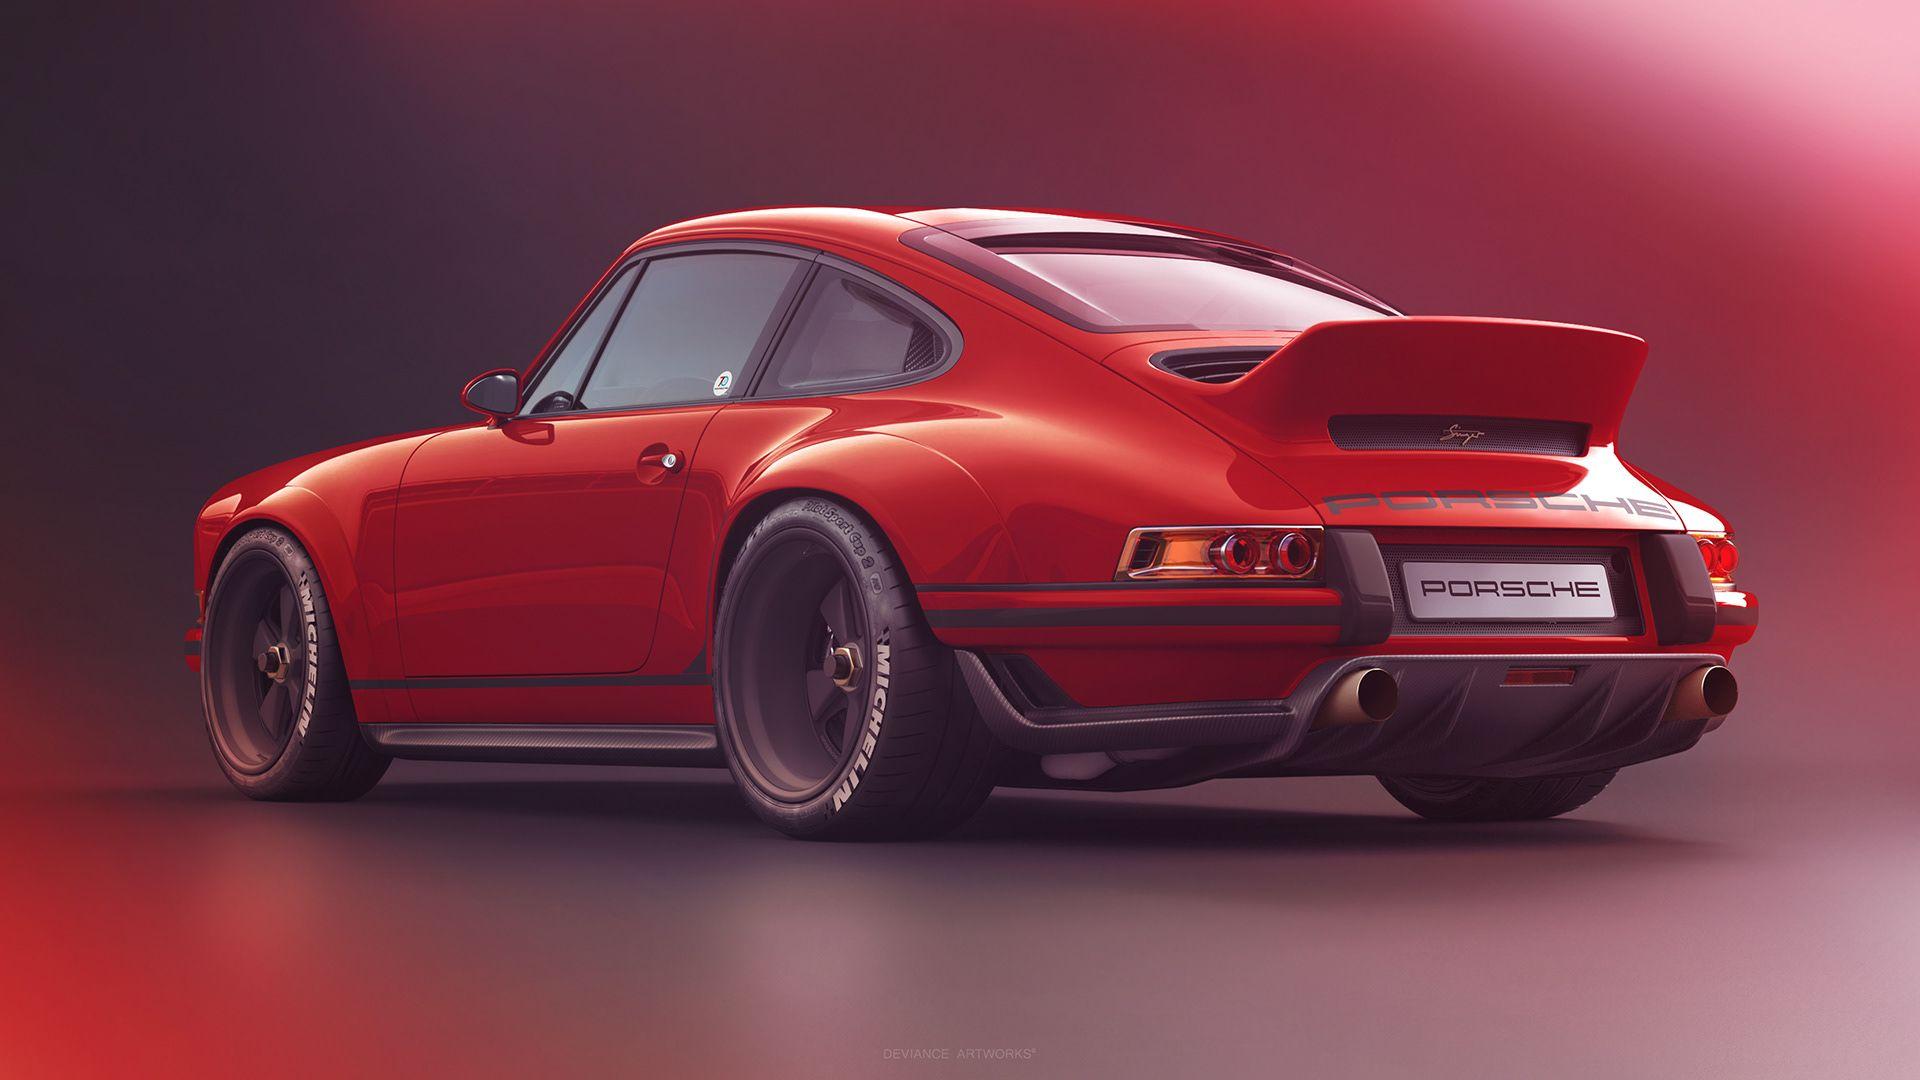 A Colors Story Singer Dls On Behance Singer Porsche Porsche Sports Car Porsche Cars